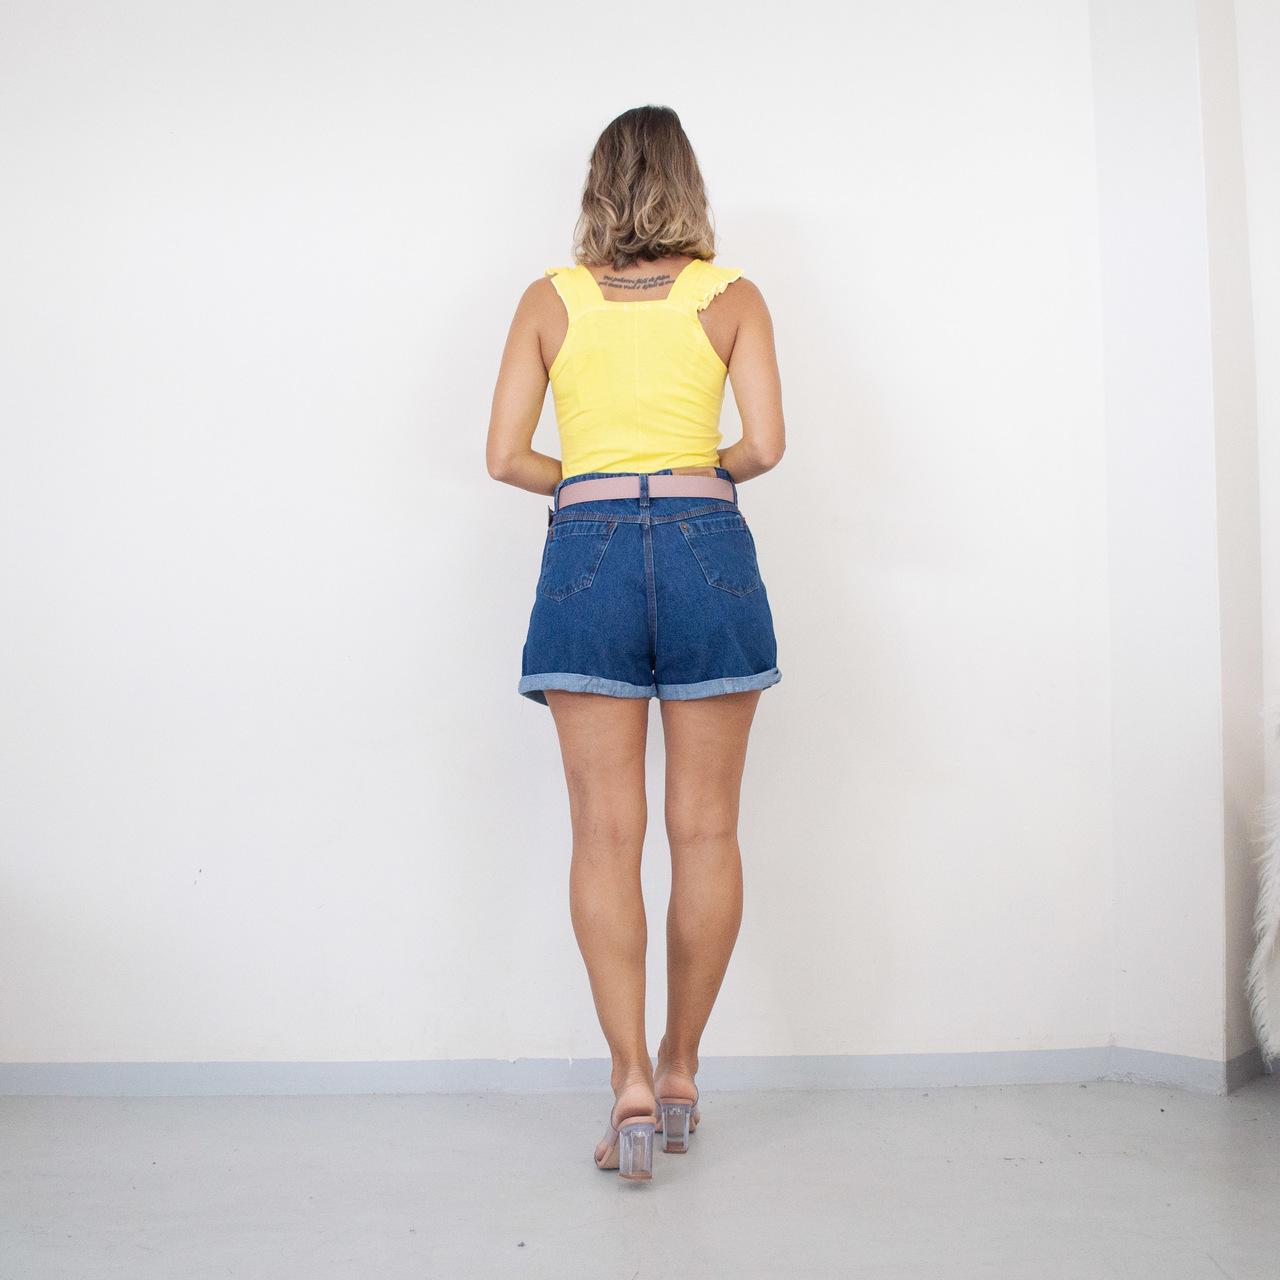 Regata Viscolycra FruFru - Amarela